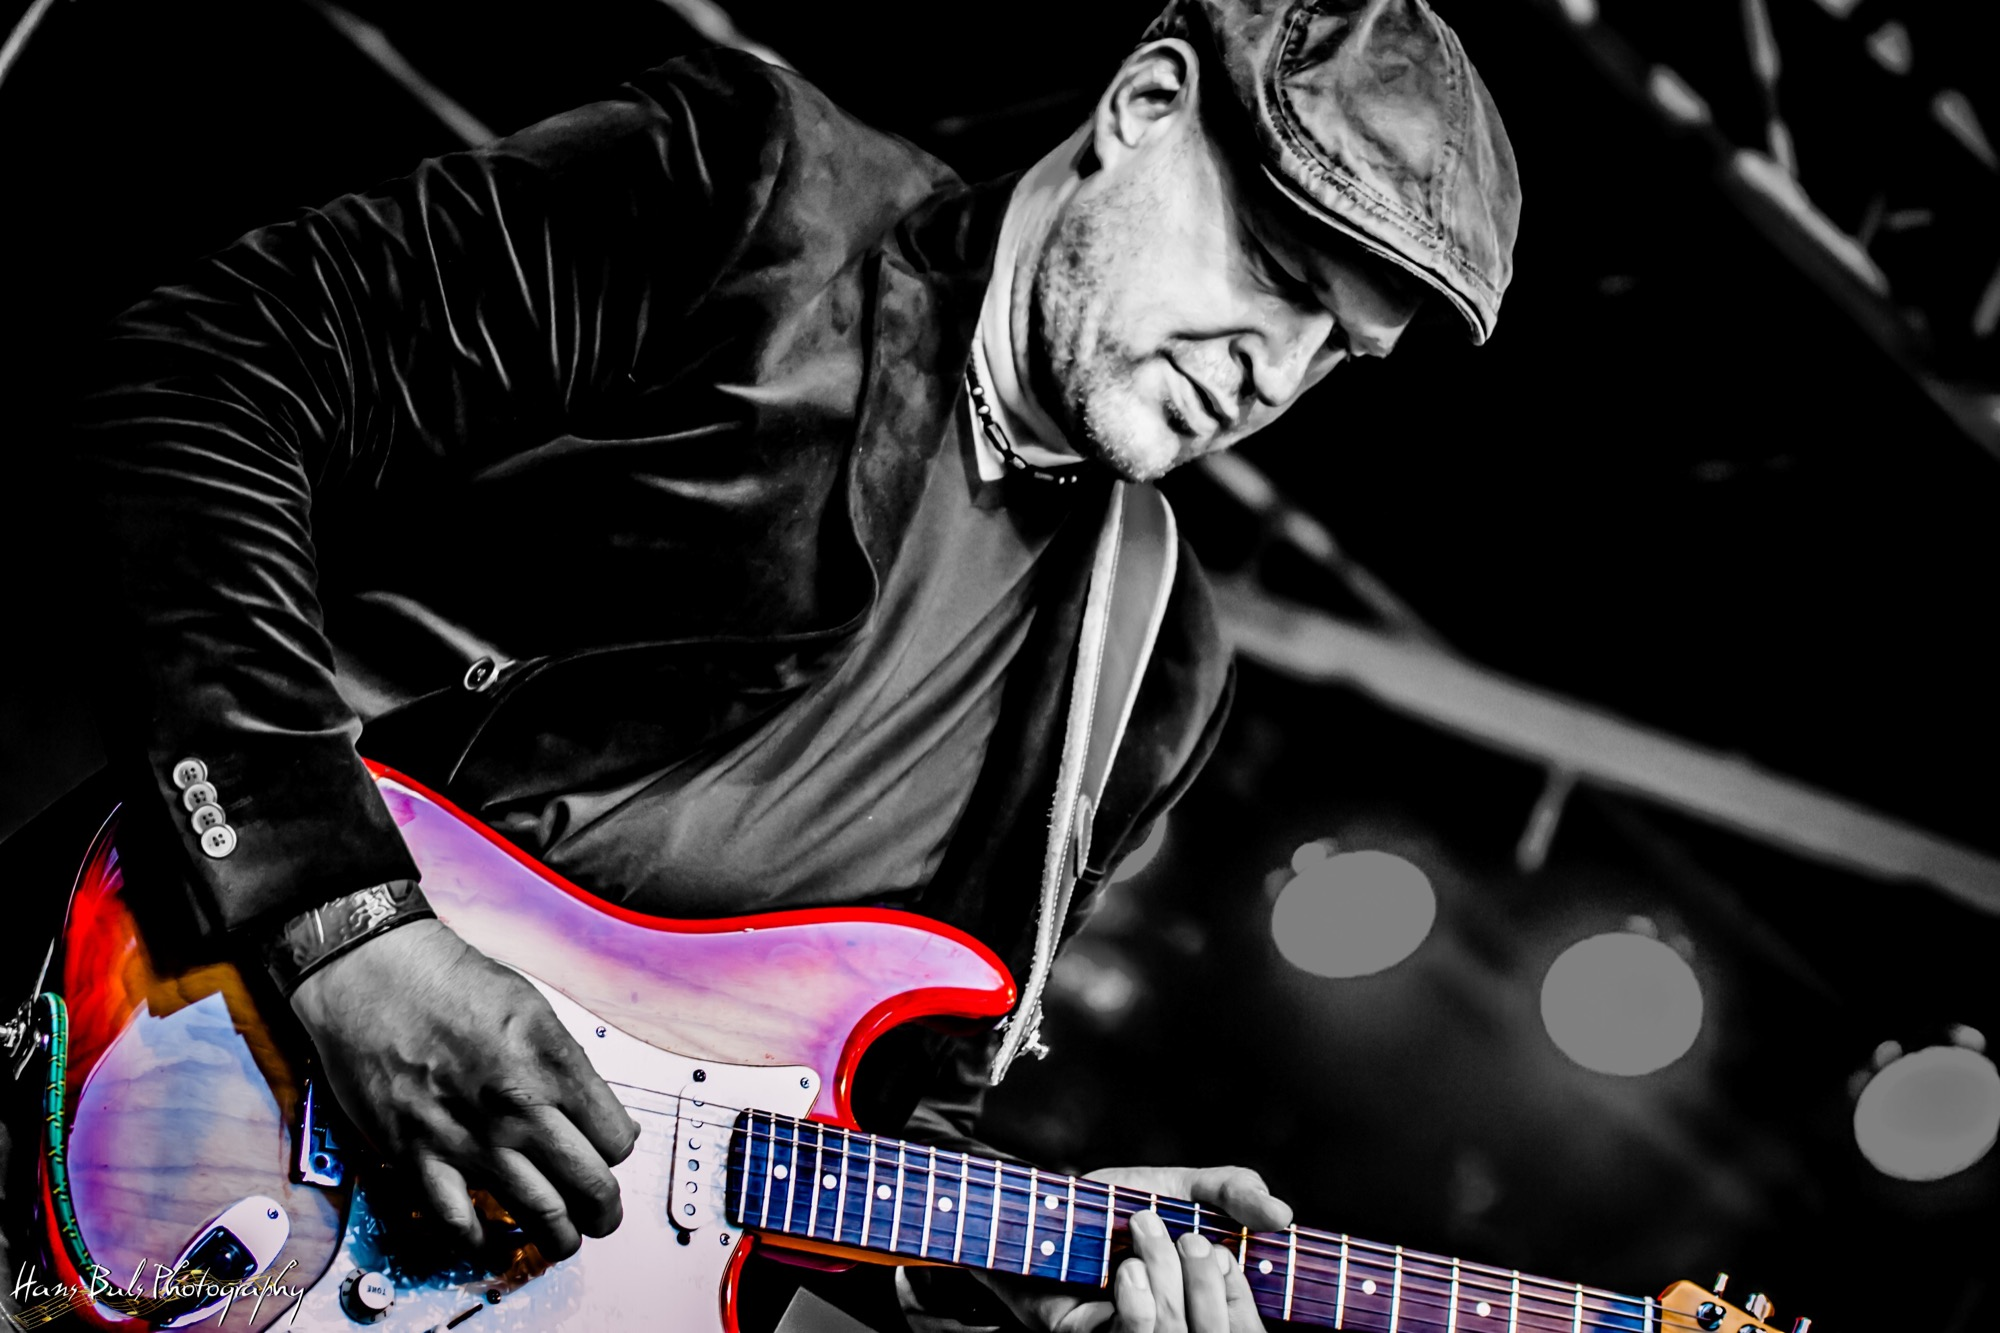 Gitarist Peter Dusseljee van de band Mojo Clinton